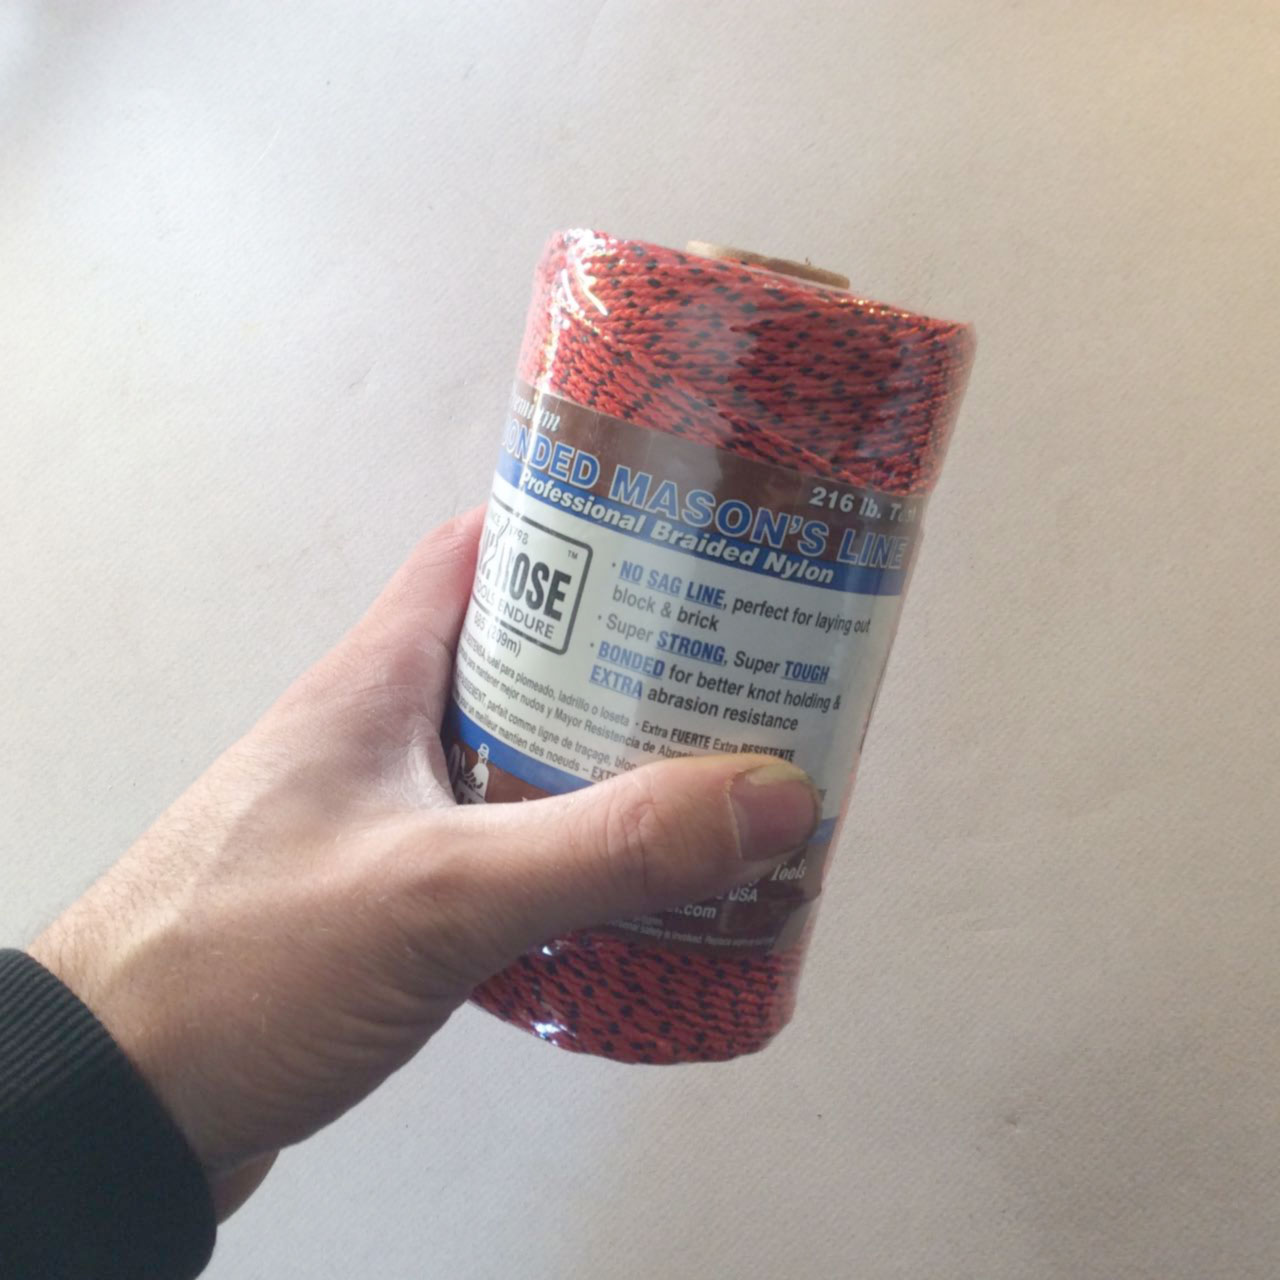 W. Rose Premium braided 216 lb test mason line